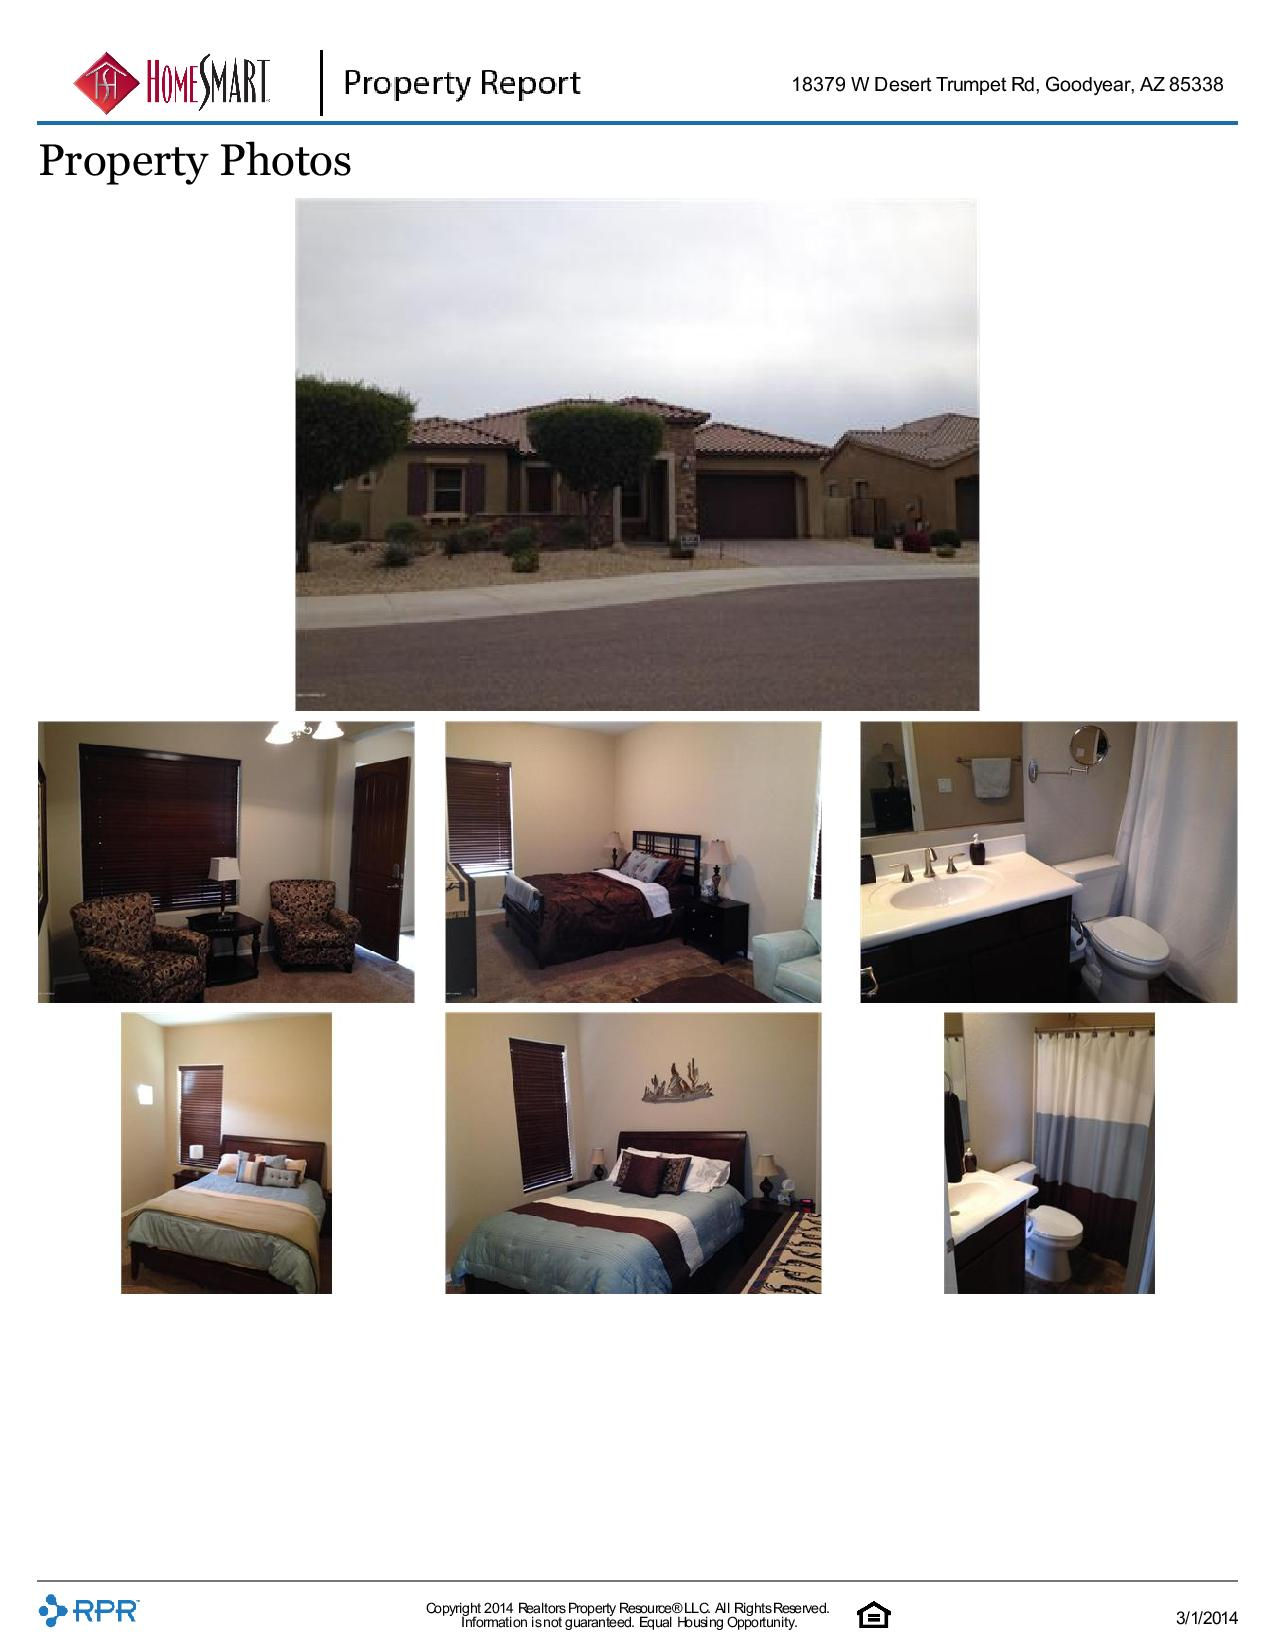 18379-W-Desert-Trumpet-Rd-Goodyear-AZ-85338-page-005